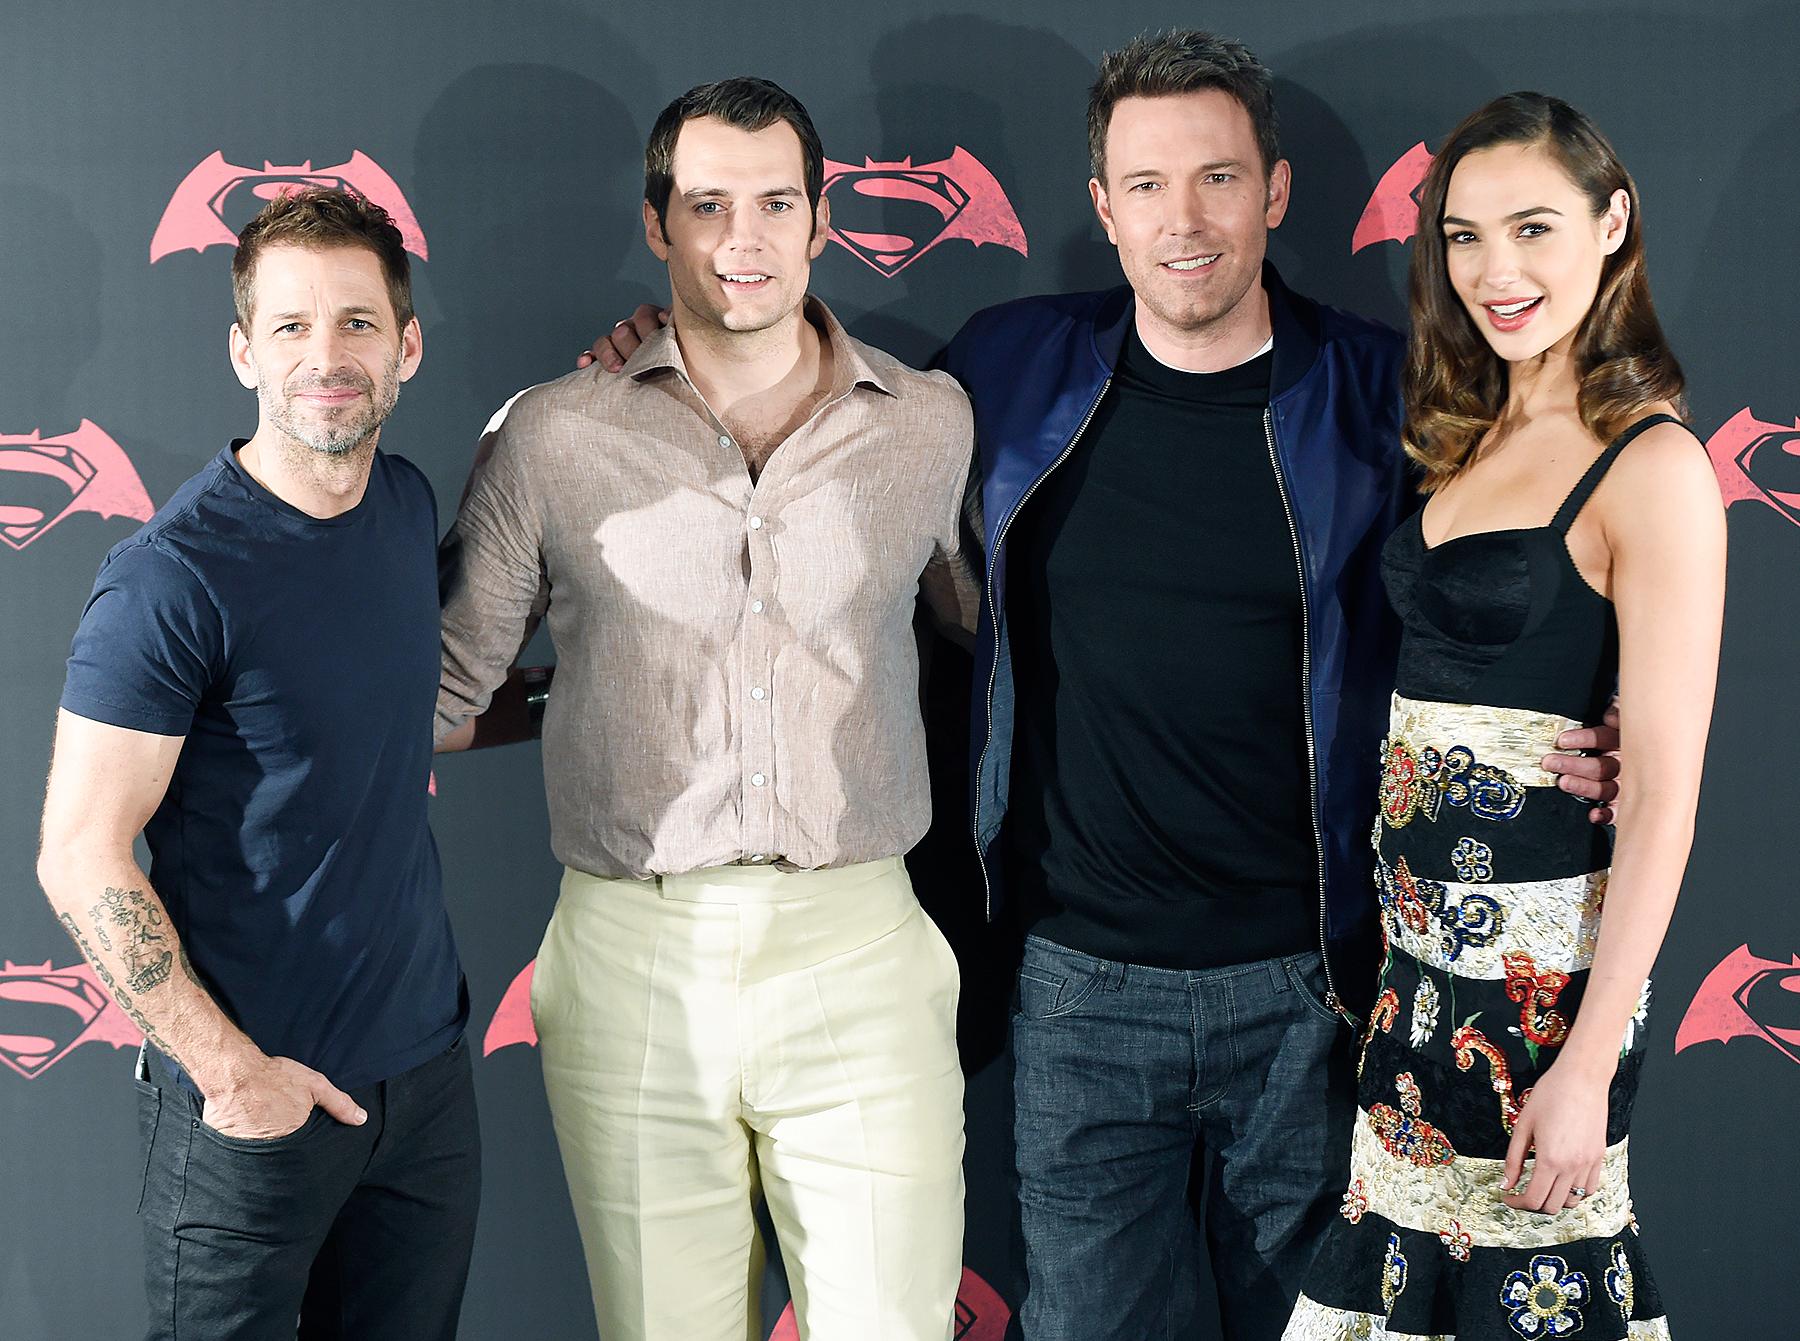 Zack Snyder, Henry Cavill, Ben Affleck and Gal Gadot